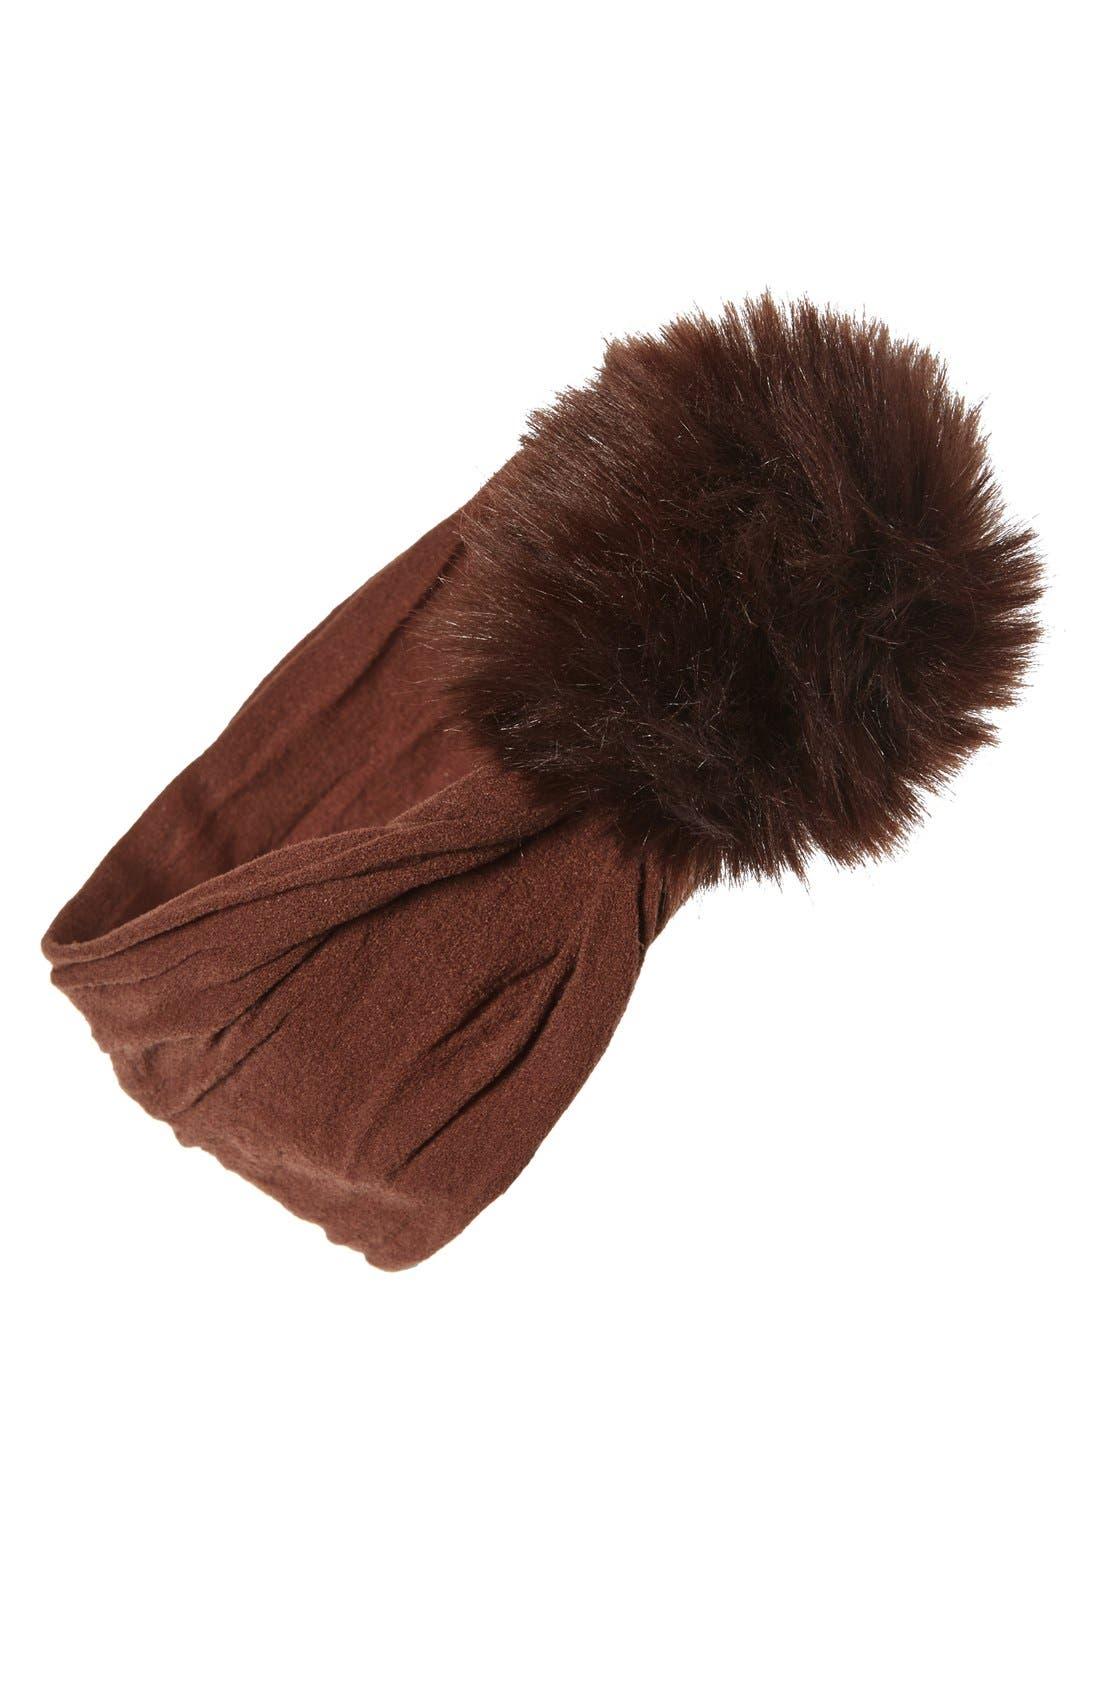 Alternate Image 1 Selected - Baby Bling Faux Fur Pompom Headband (Baby Girls)